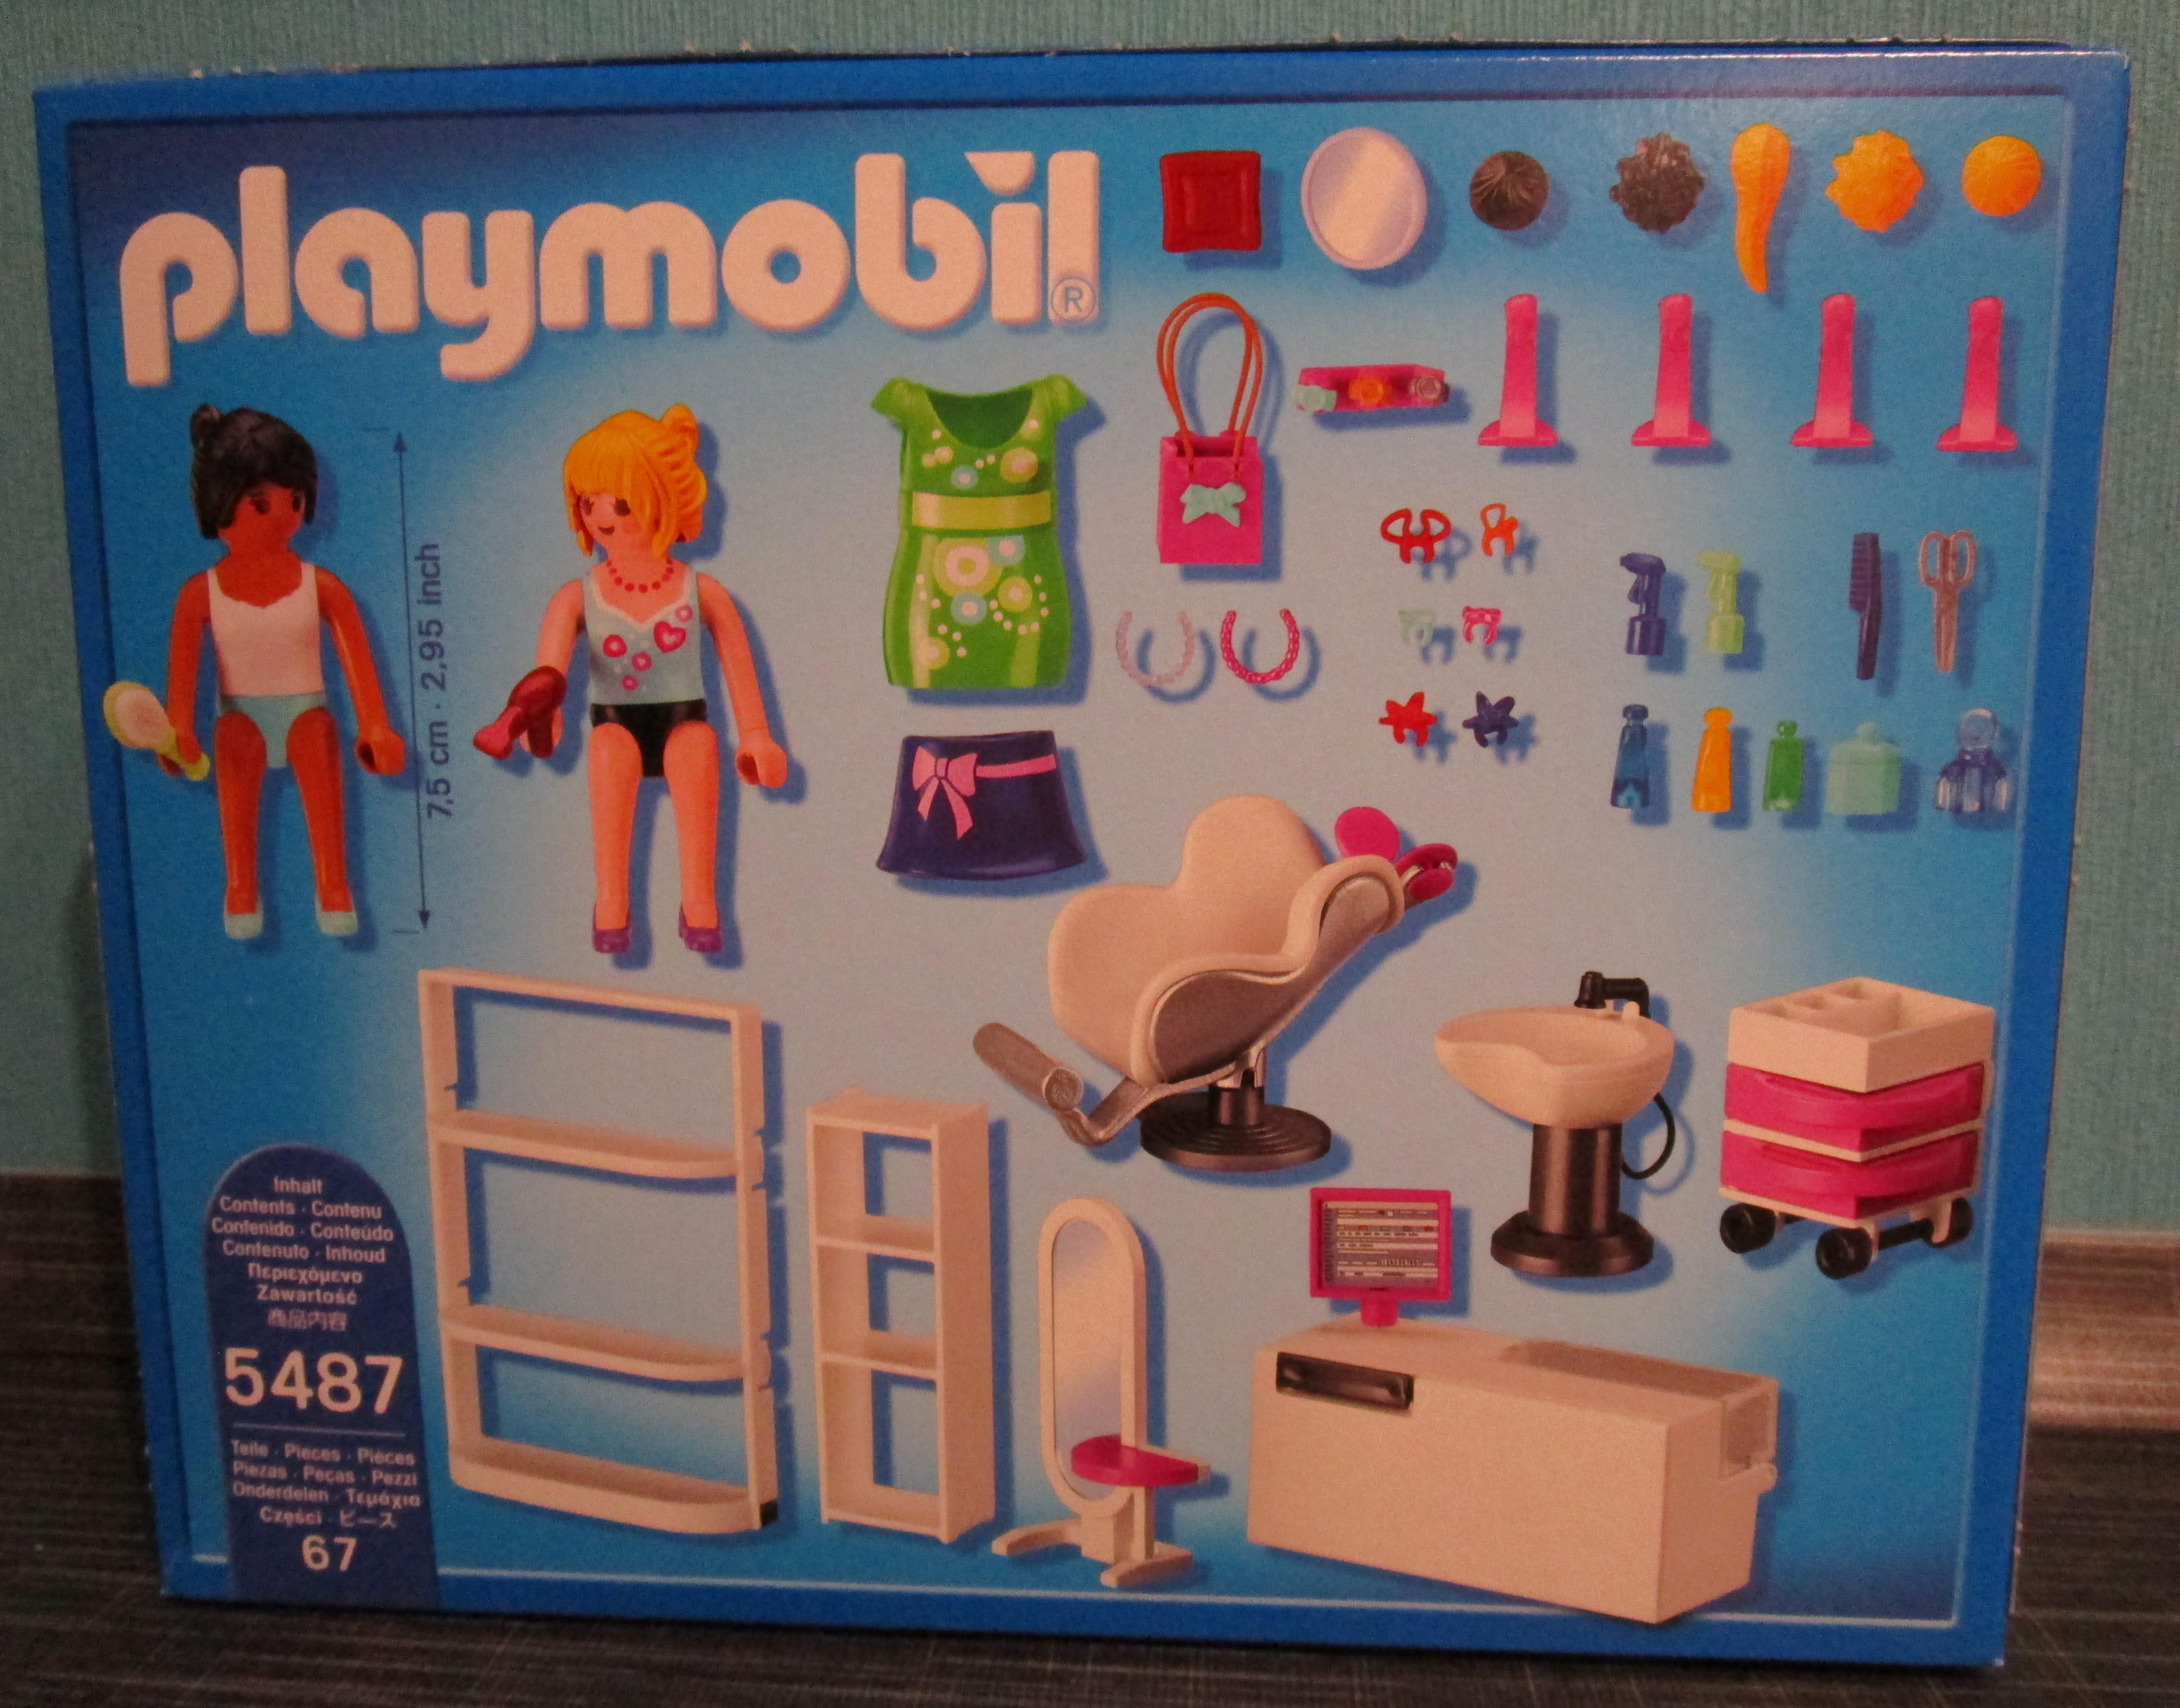 Playmobil 5487 Beauty Salon Verpackung hinten Playmobil Spielzeug im Vergleich: Friseursalon 4413 vs. Beauty Salon 5487   Rollenspiel Waschen, schneiden, fönen   bitte